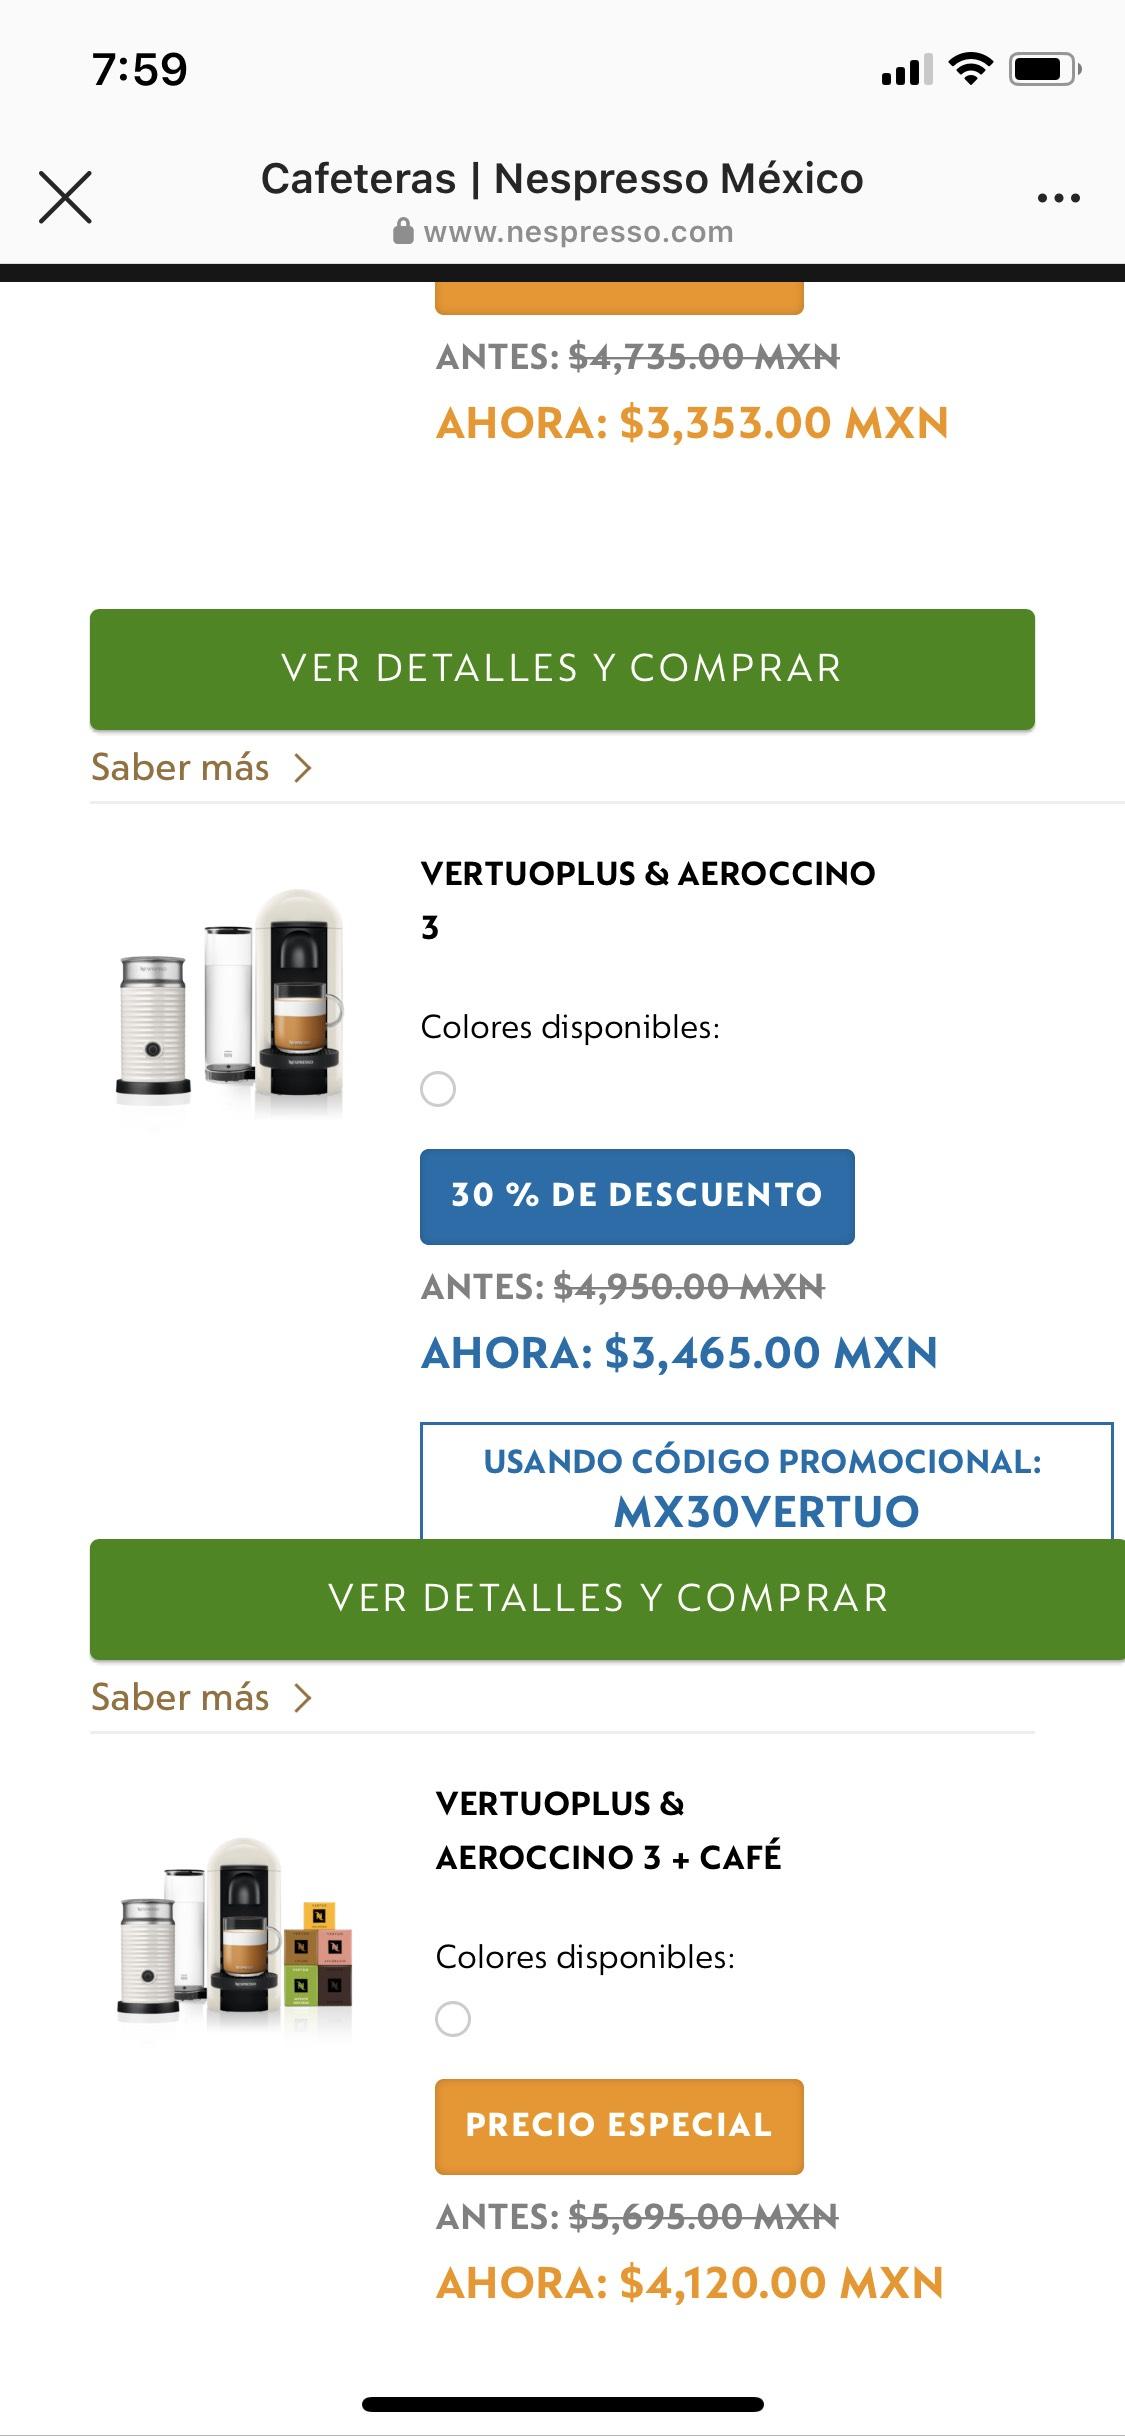 Nespresso: Cafetera Vertuo Plus